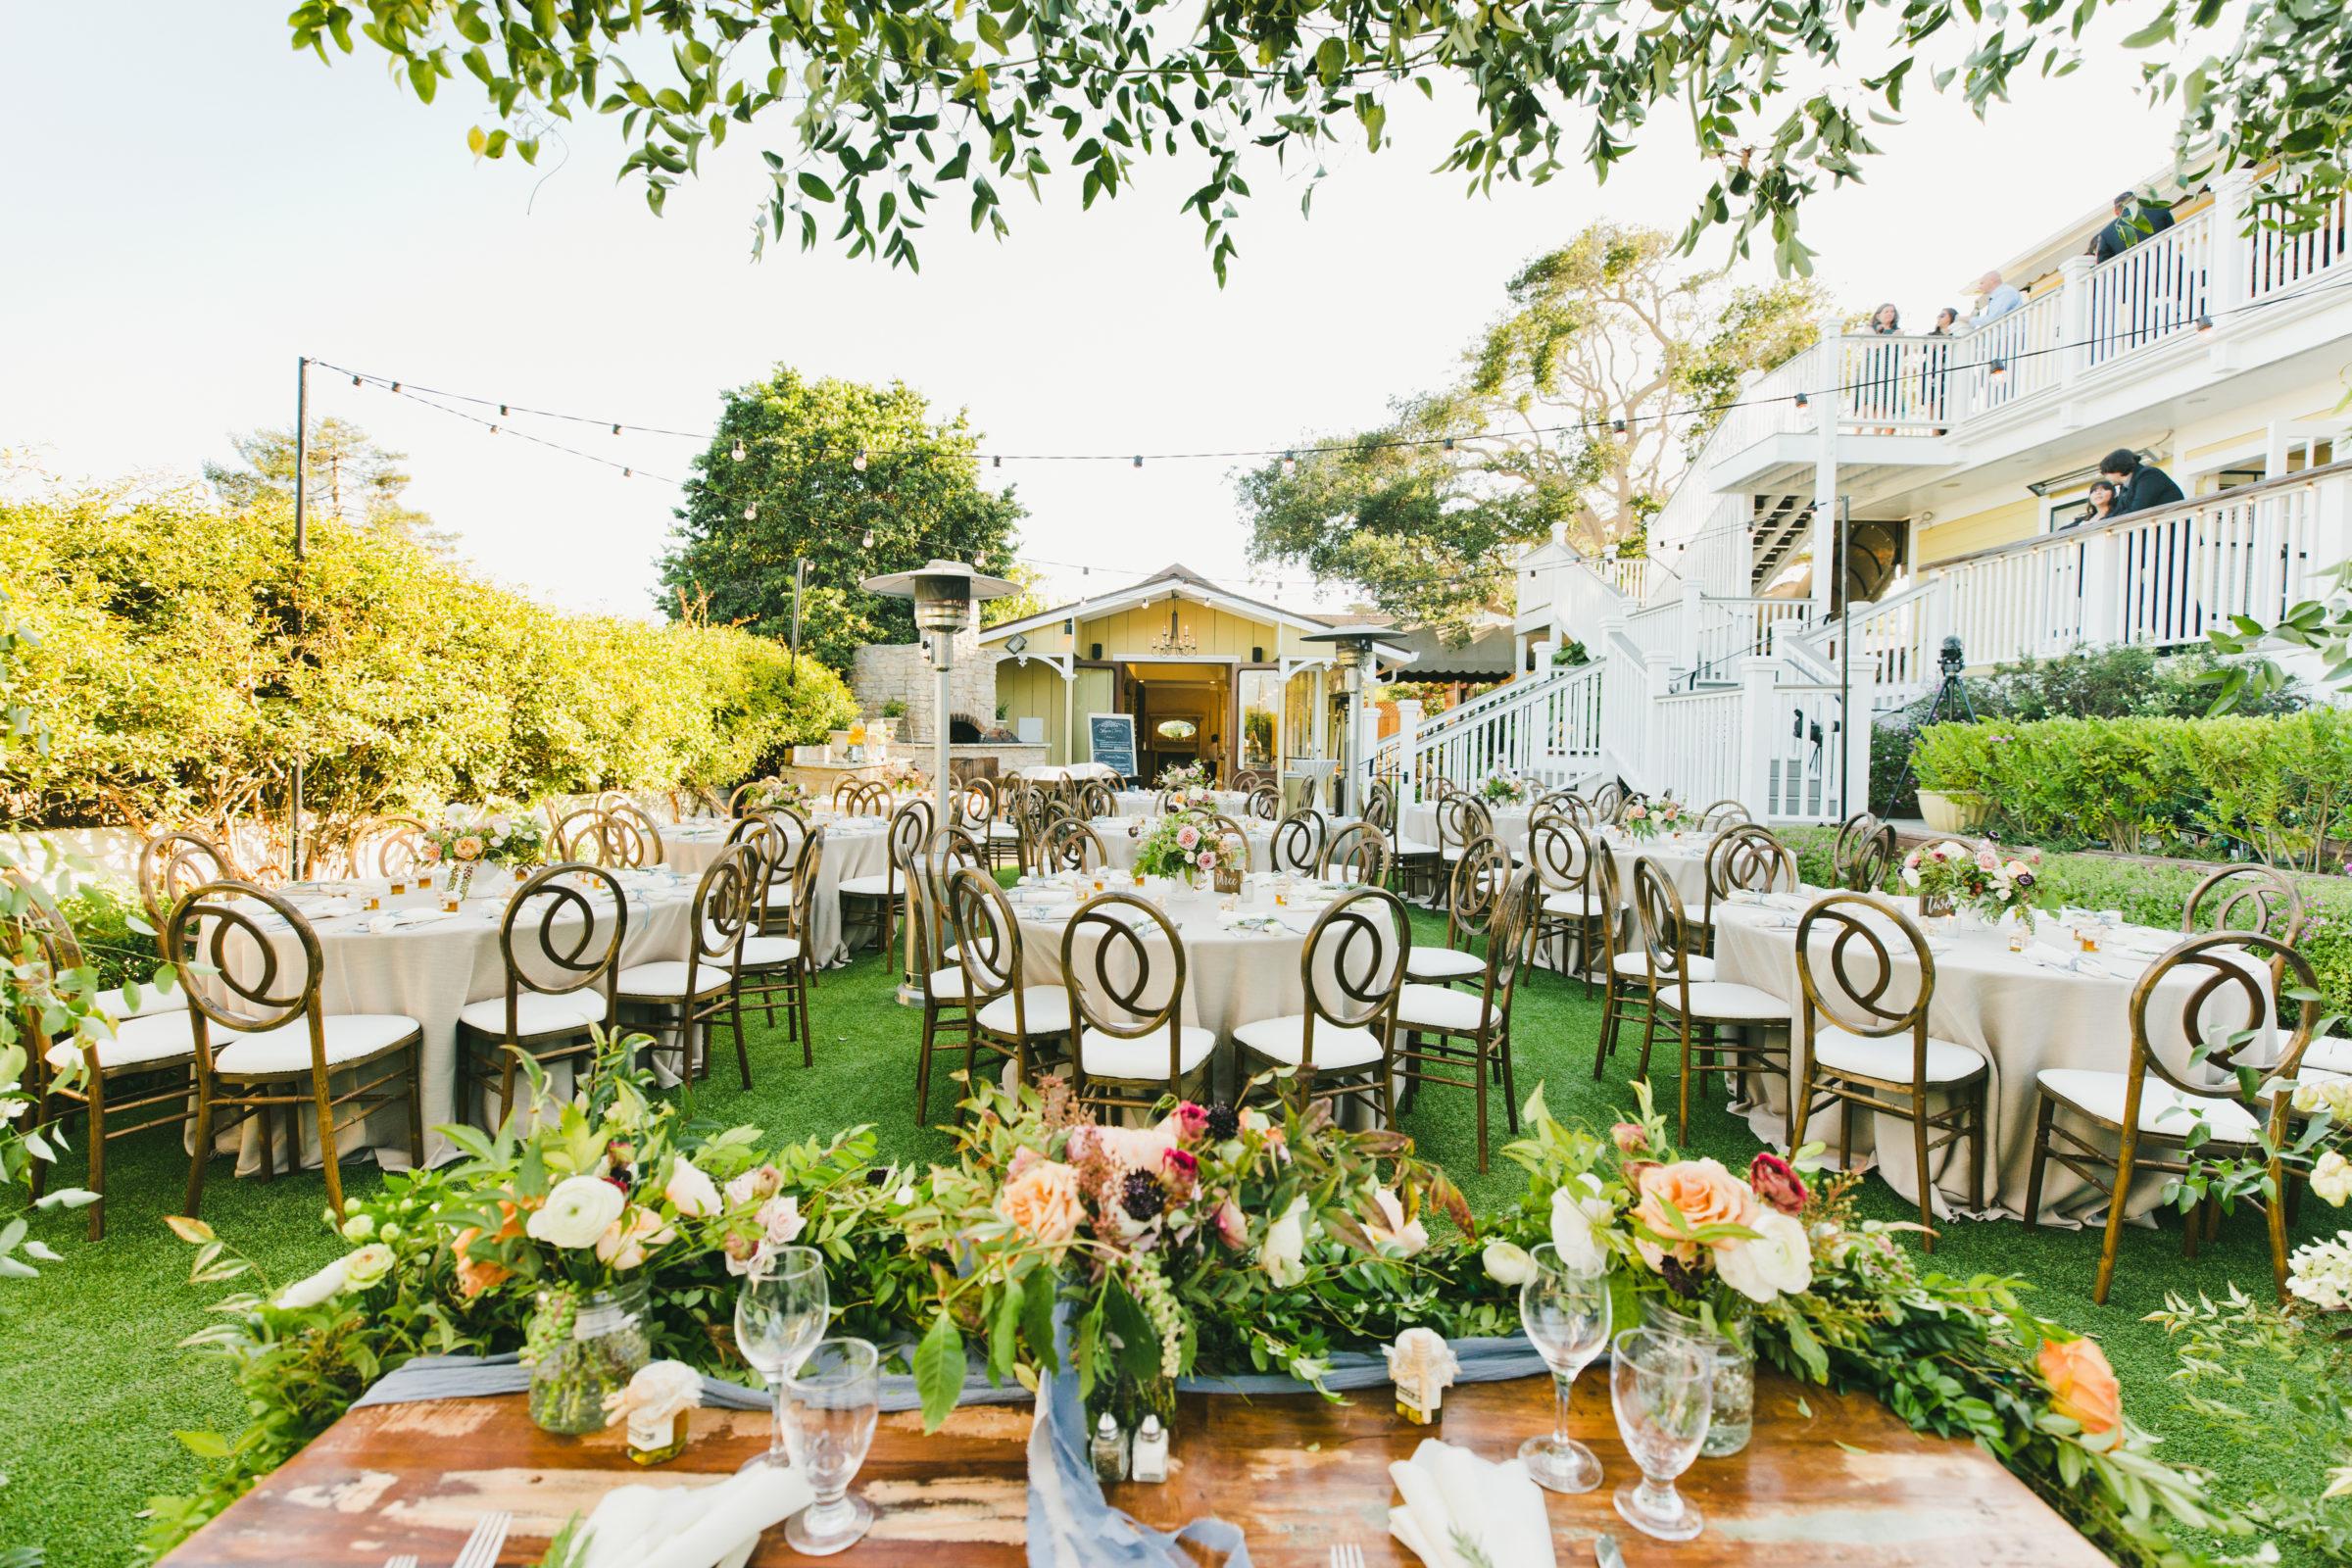 Beautiful Garden Setup Looking at Carriage House